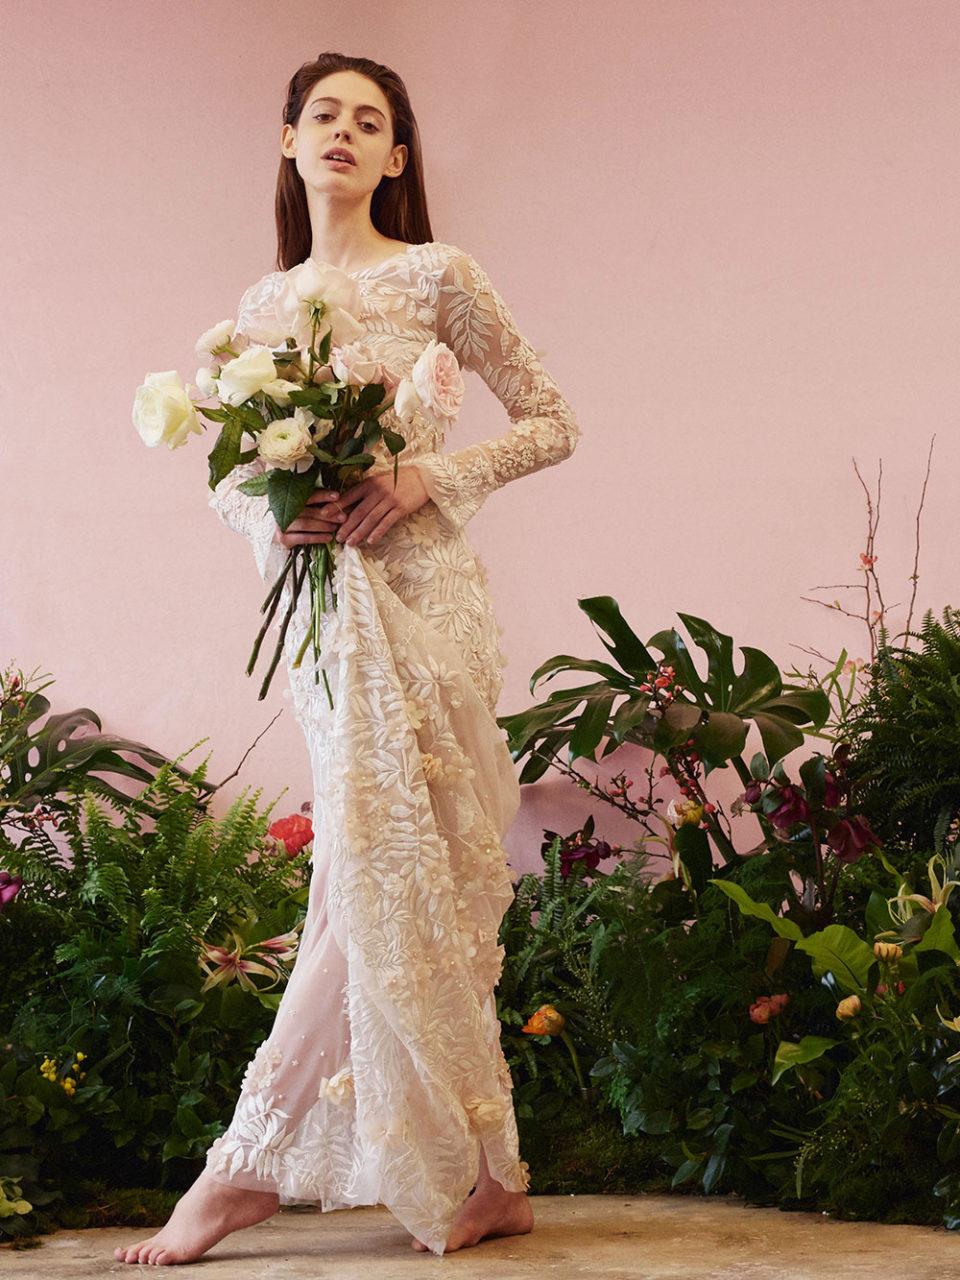 Introducing The Eccentric Elegant Hermione De Paula Bridal Collection